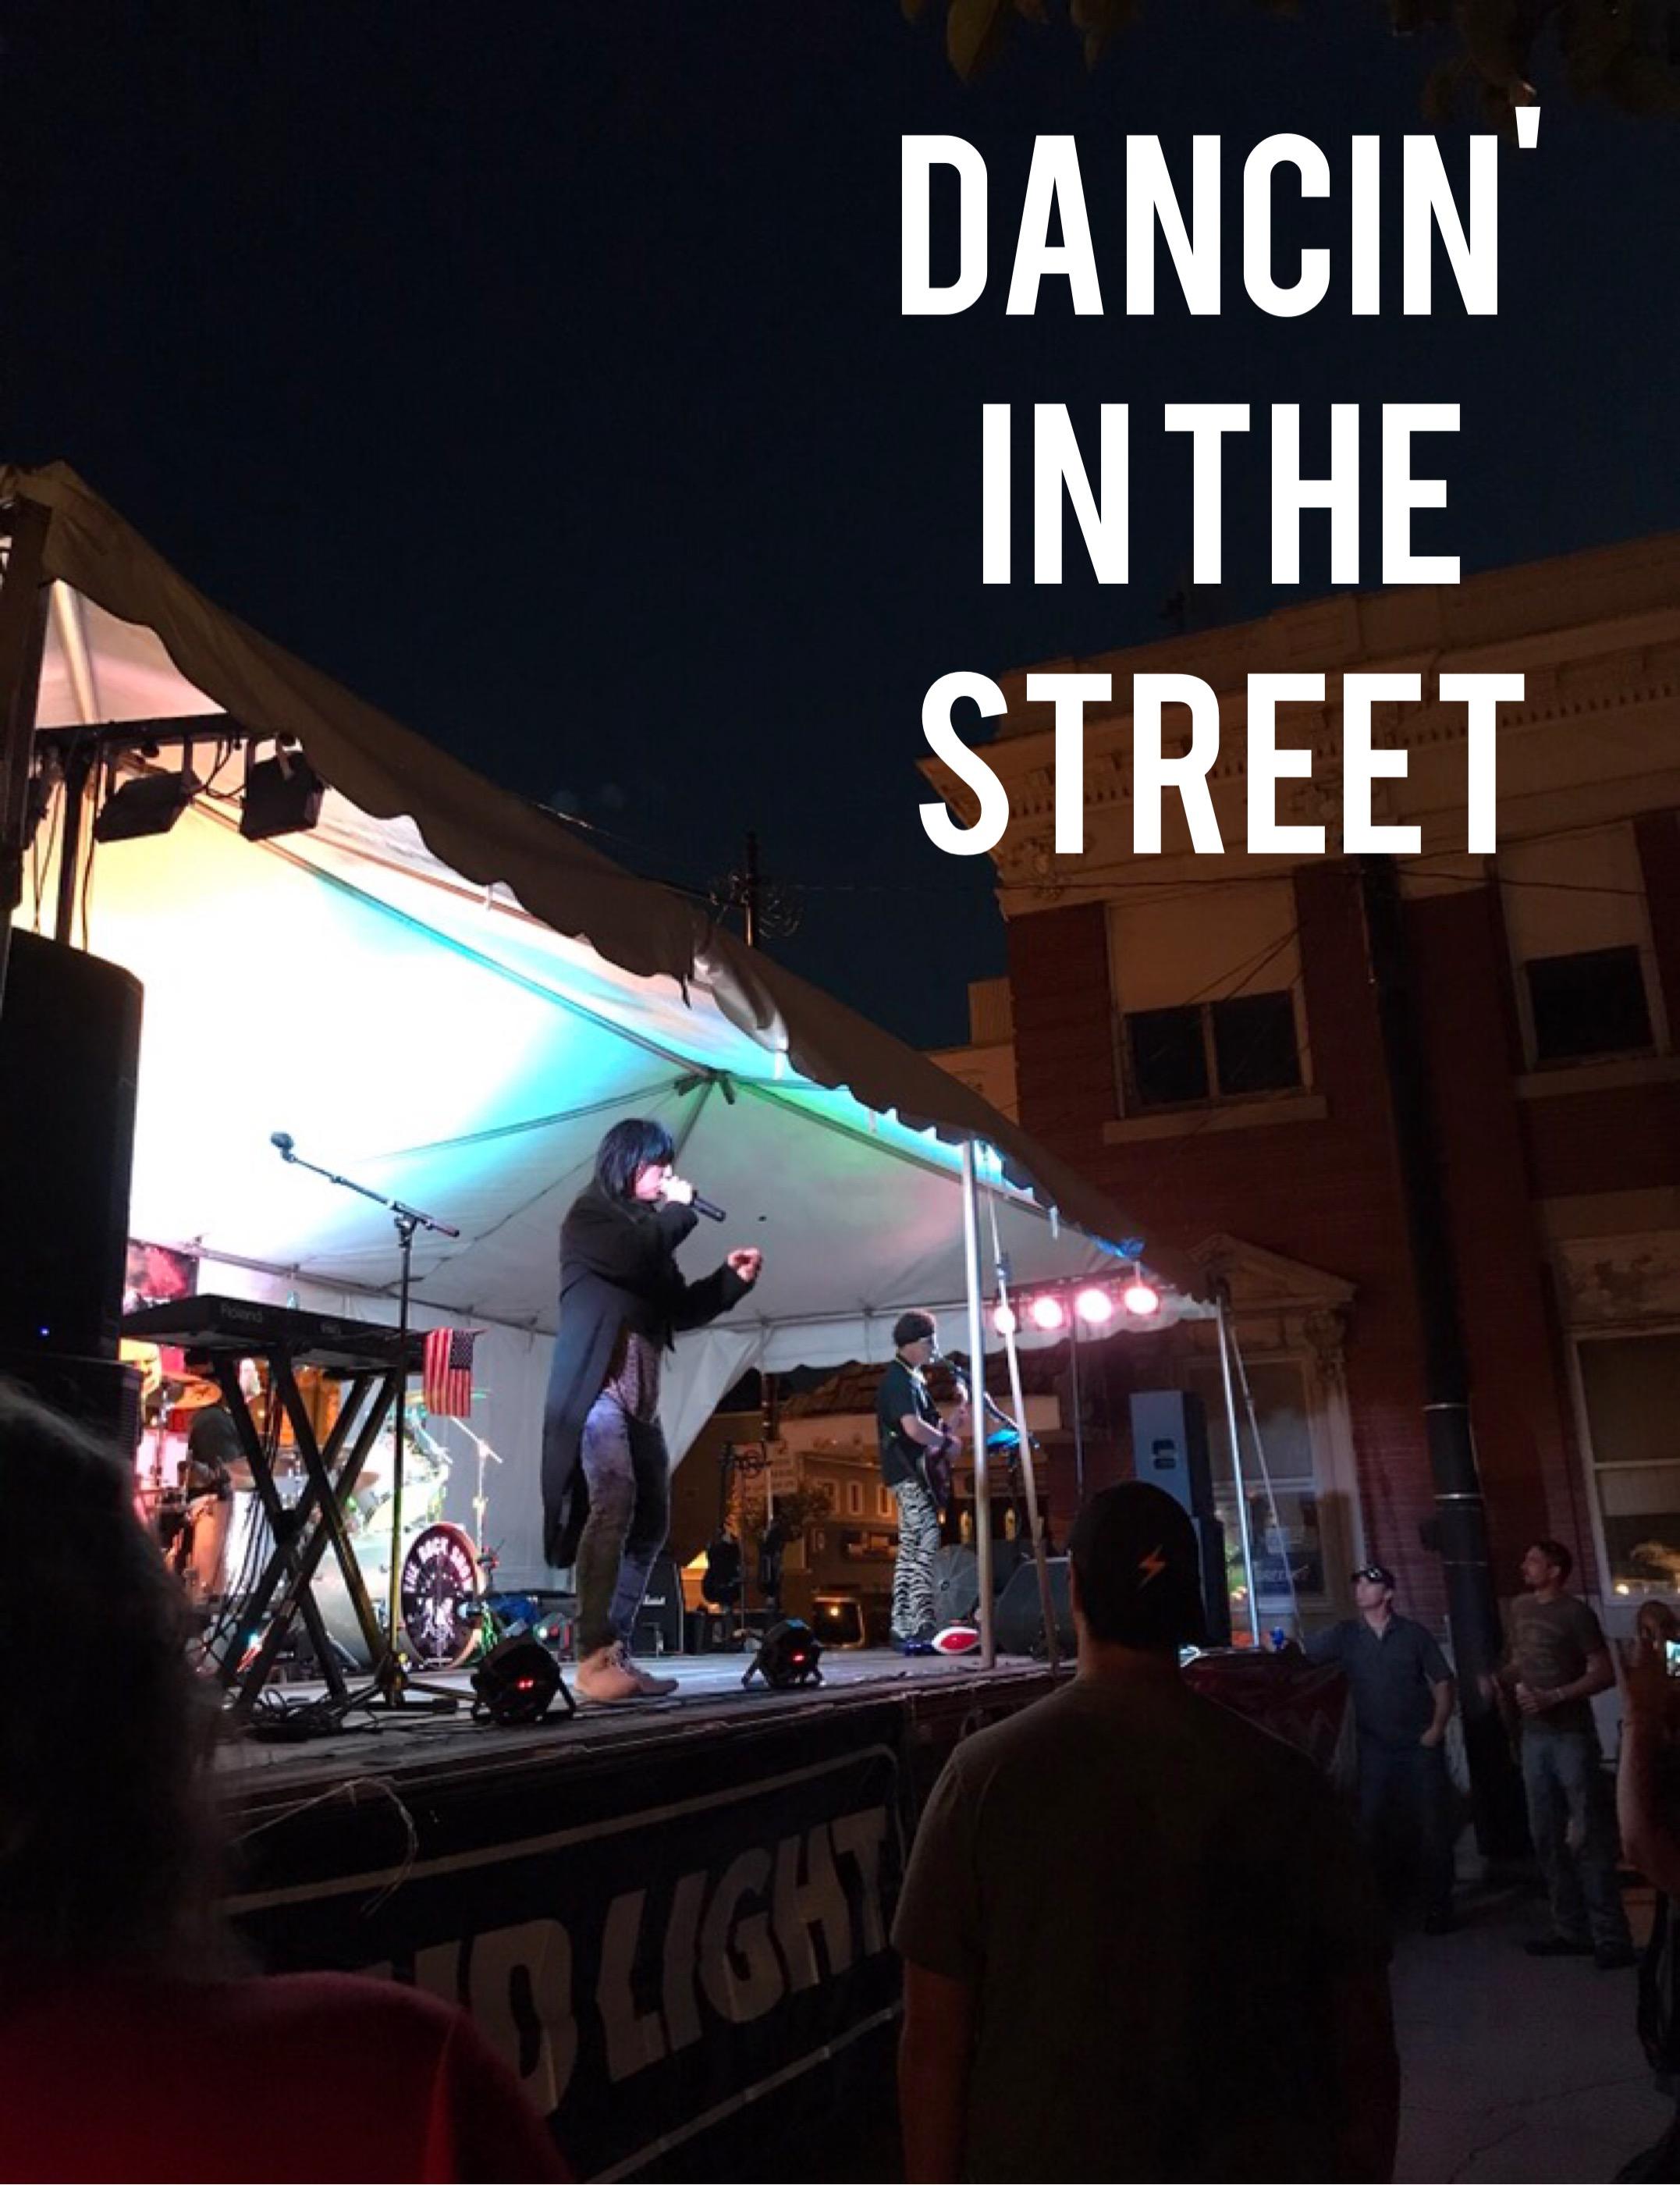 Dancin in the Street.JPG